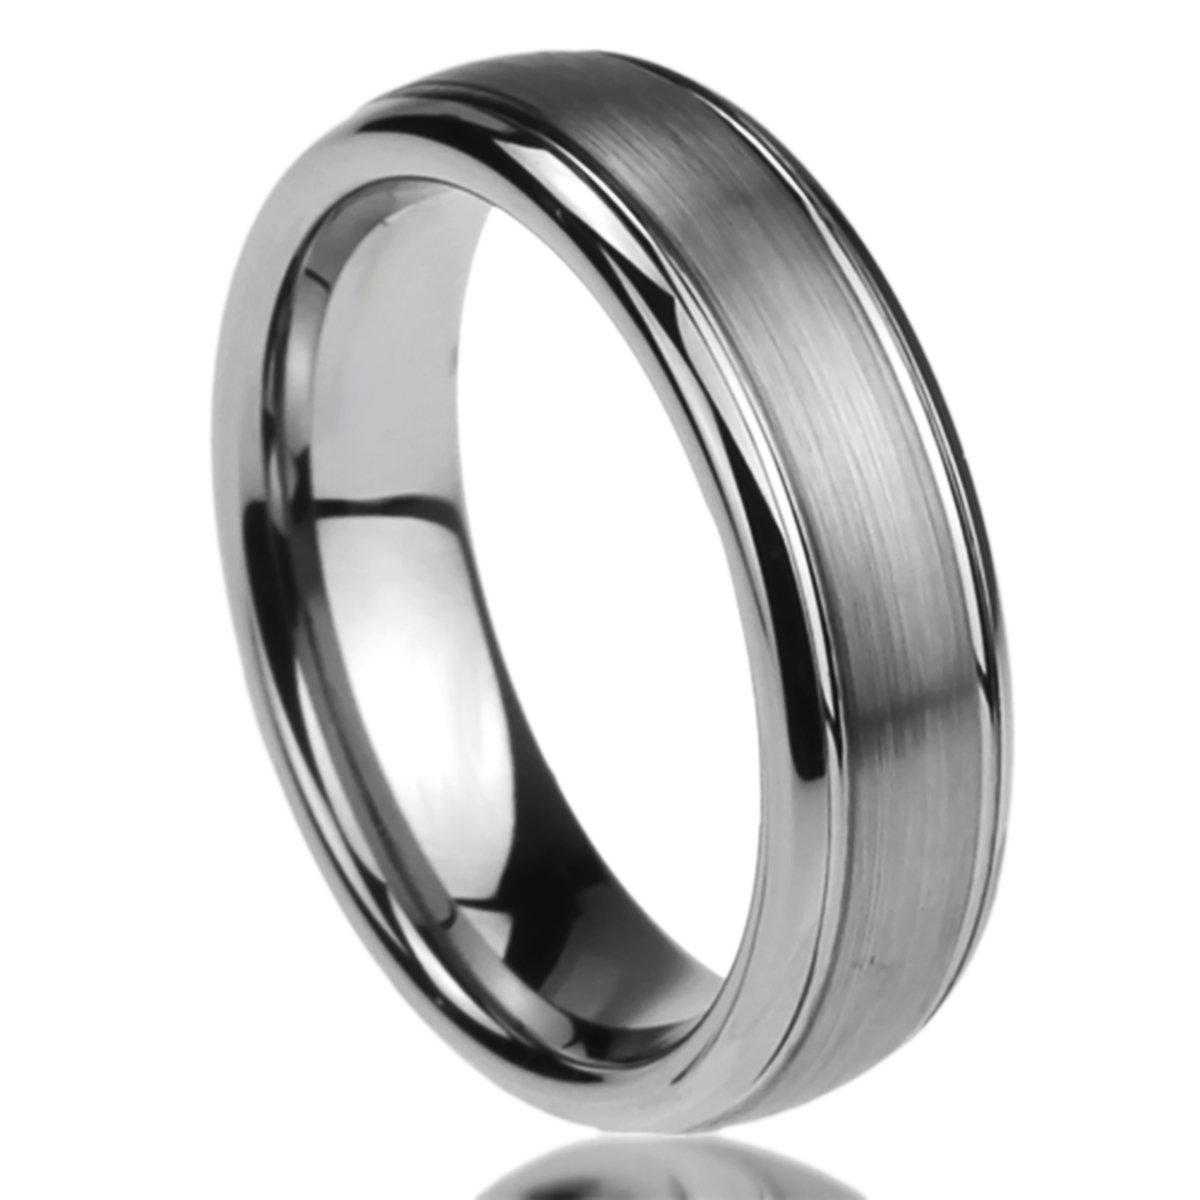 Prime Pristine Titanium Wedding Band Ring for Men & Women Brushed Centered Domed Ring for Men & Woman